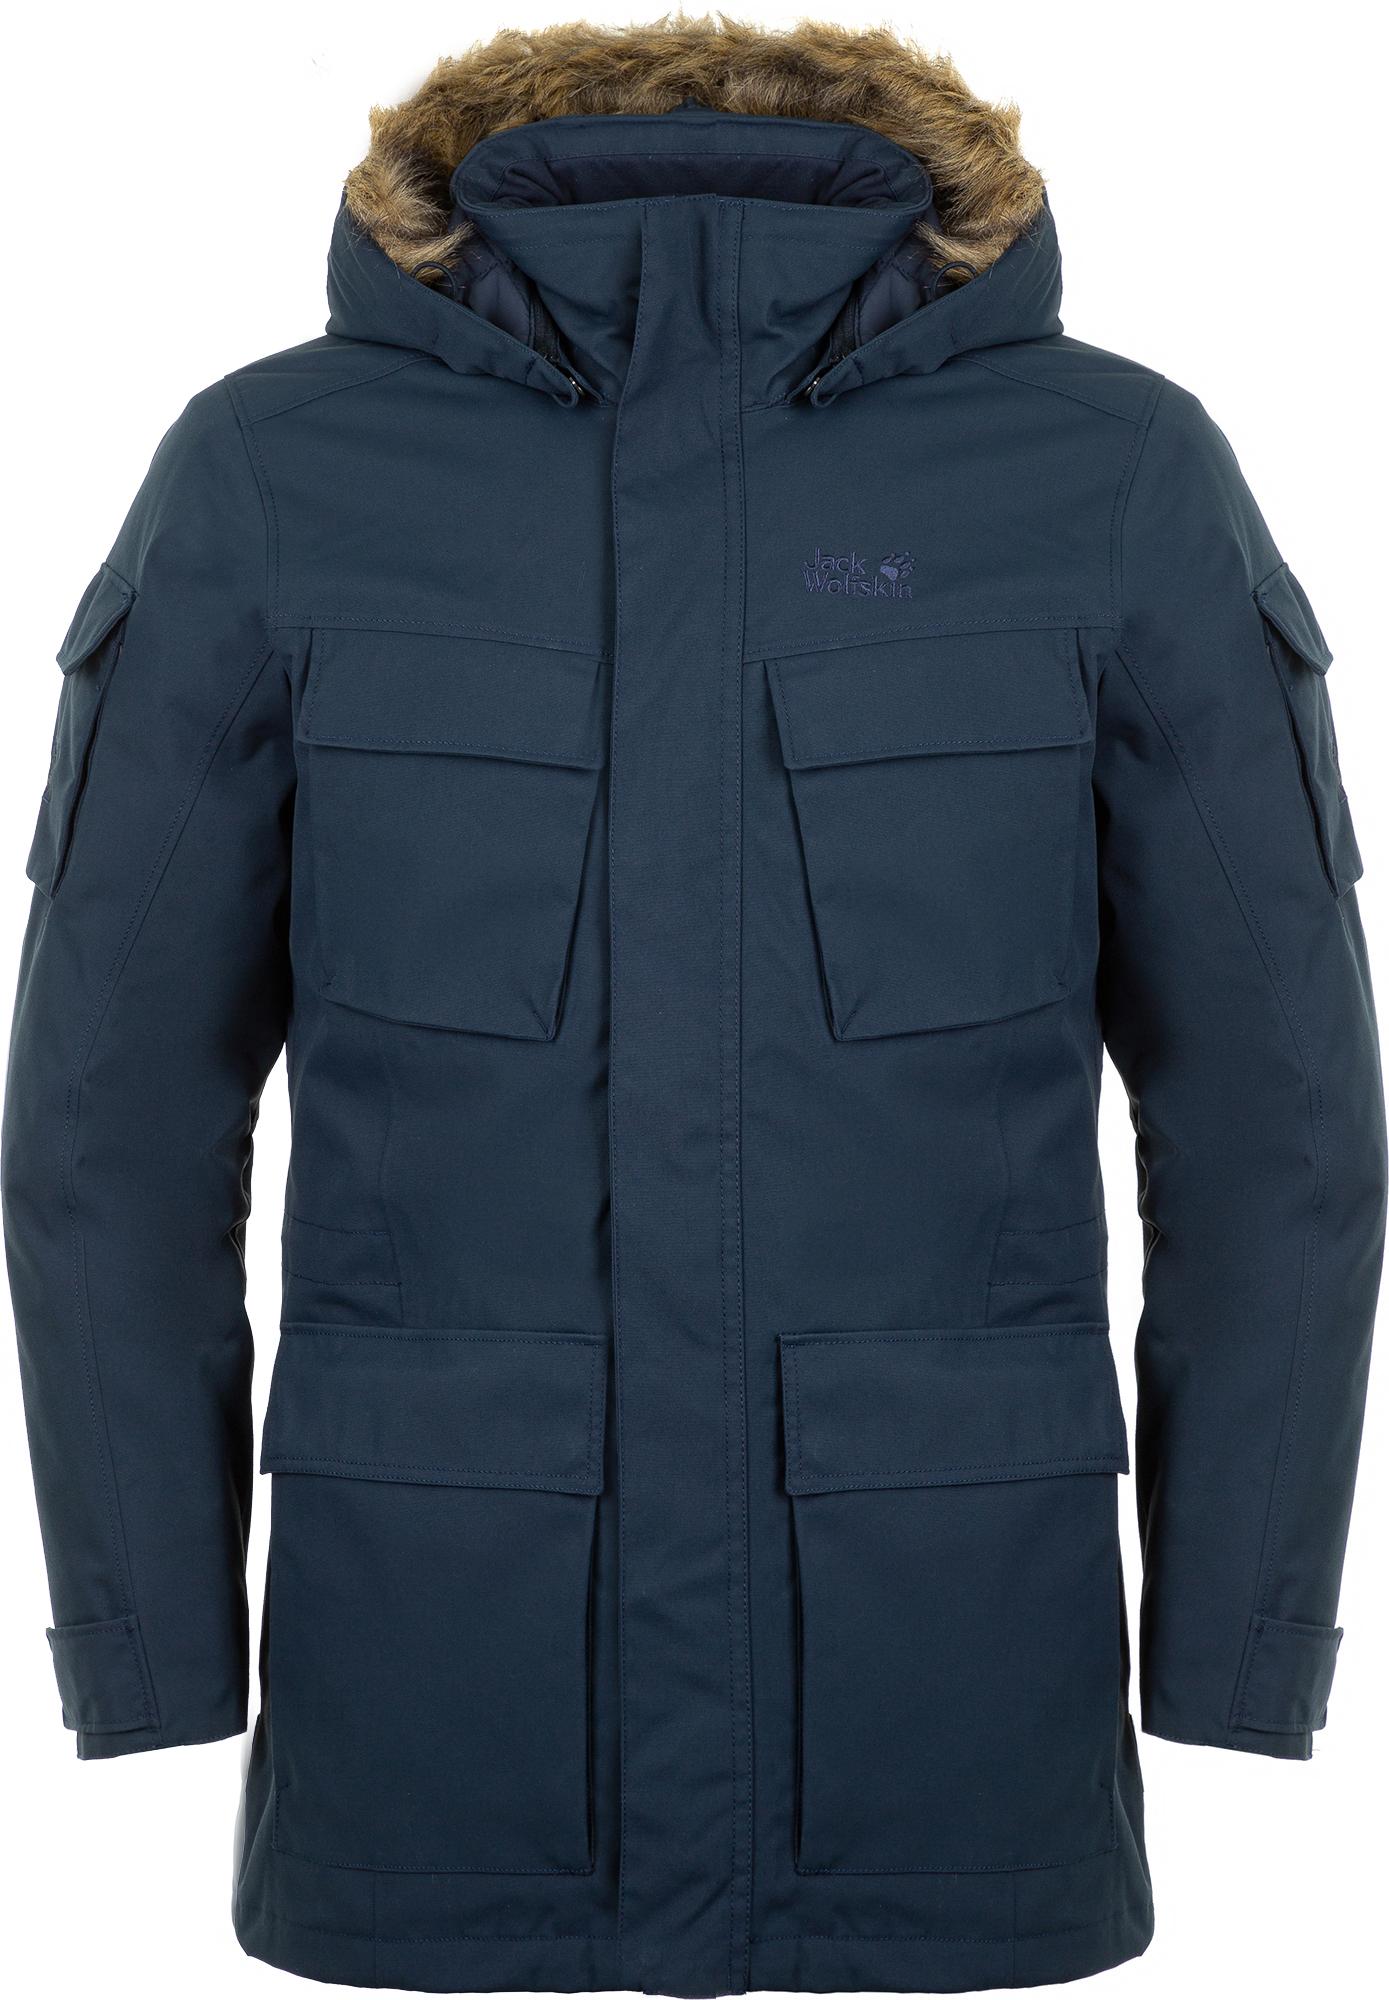 Jack Wolfskin Куртка утепленная мужская Jack Wolfskin Glacier Canyon, размер 58